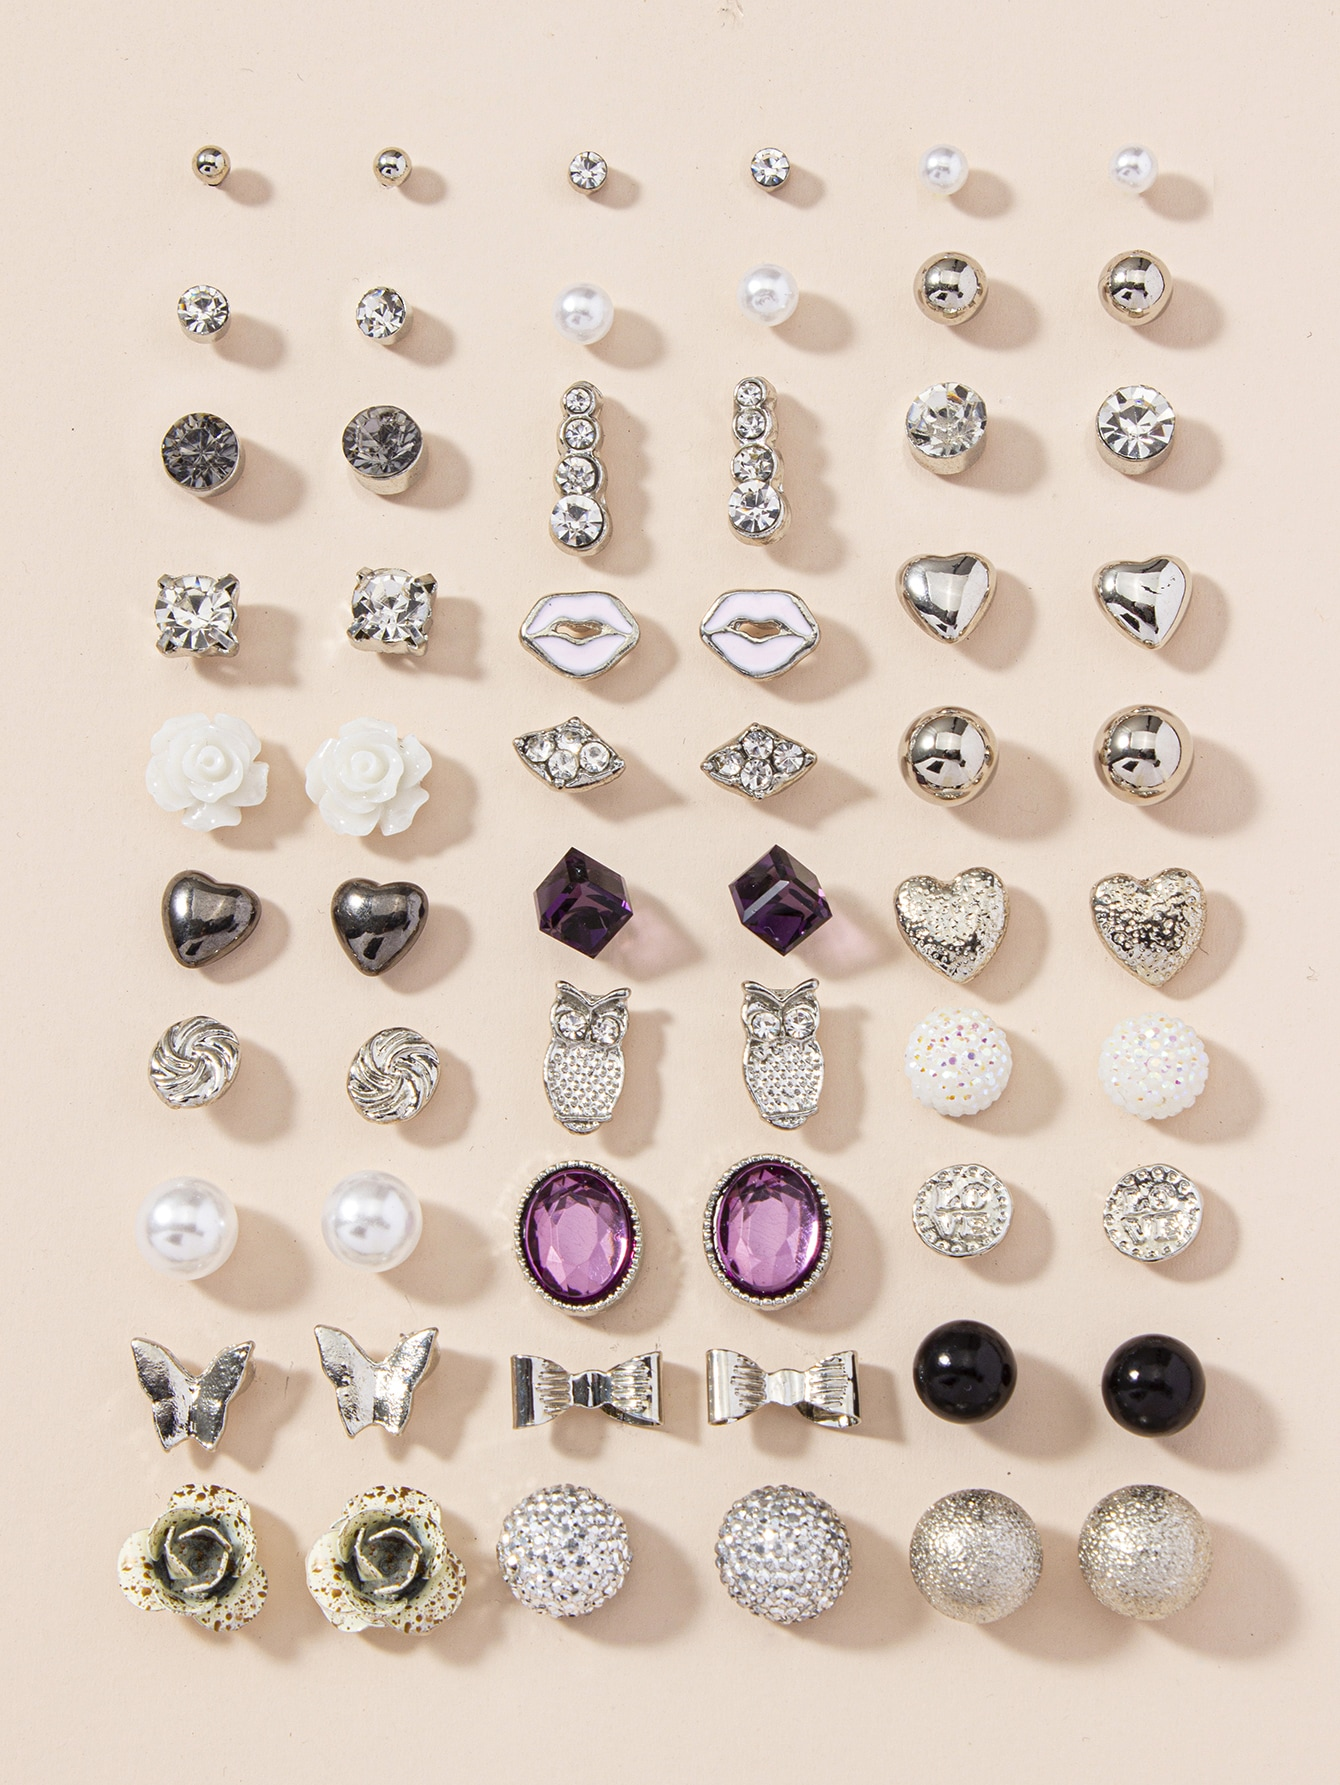 30pairs Heart & Butterfly Design Stud Earrings thumbnail